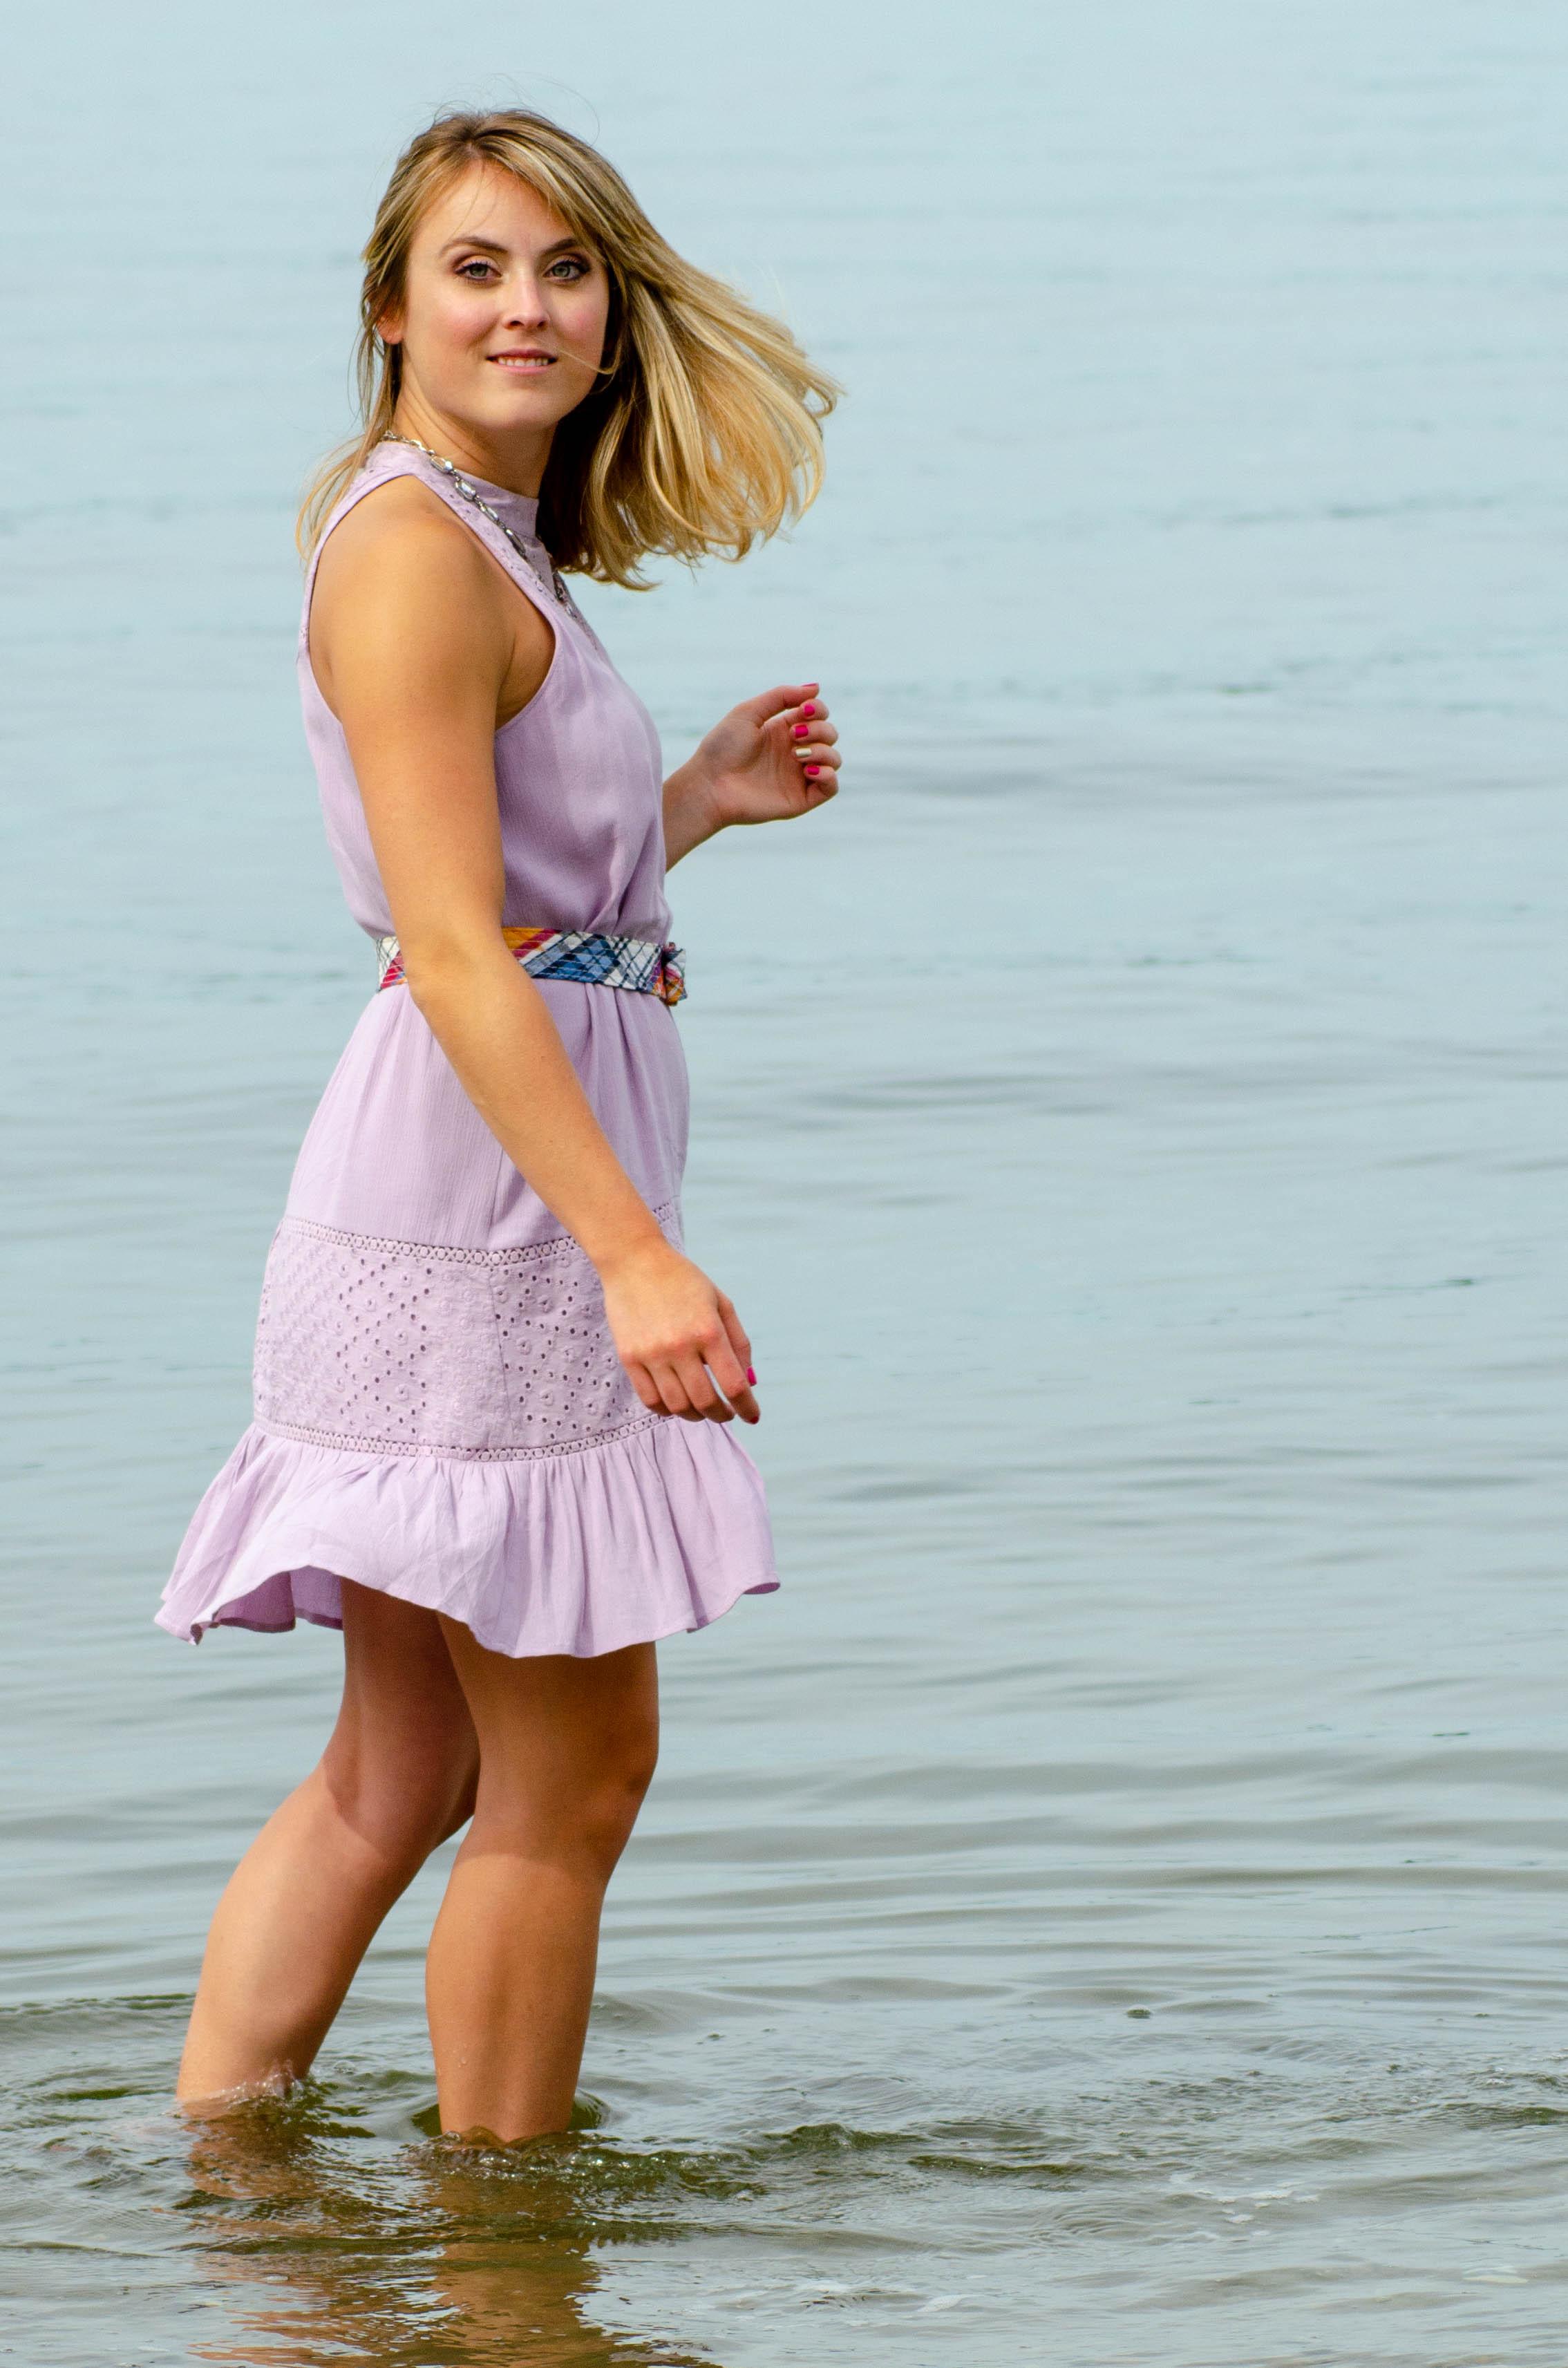 Lyndsey at beach